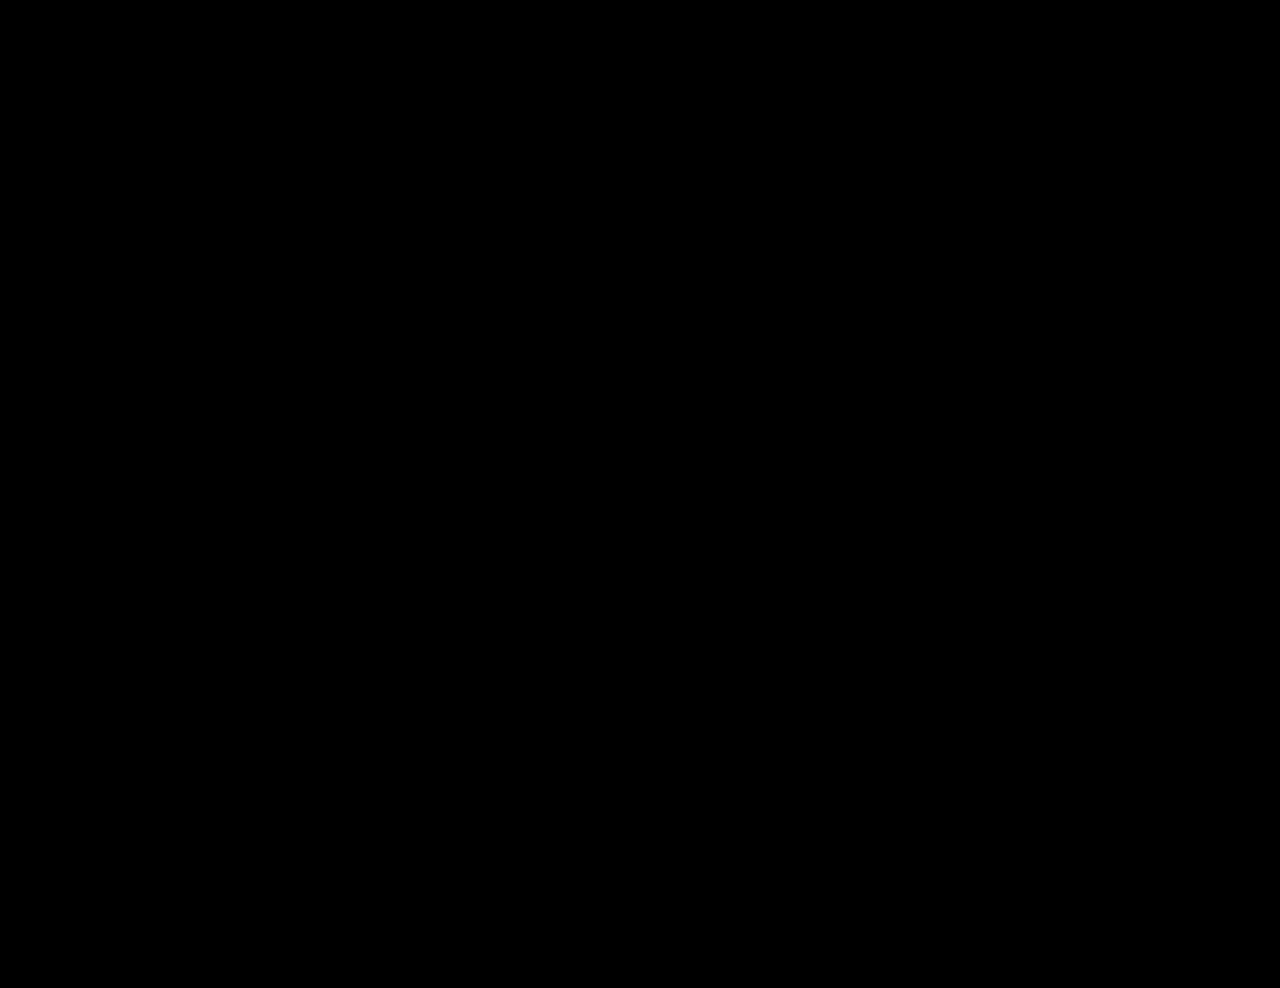 Kuchyňská baterie SCHOCK LEVA Cristalite+® Moonstone 511120